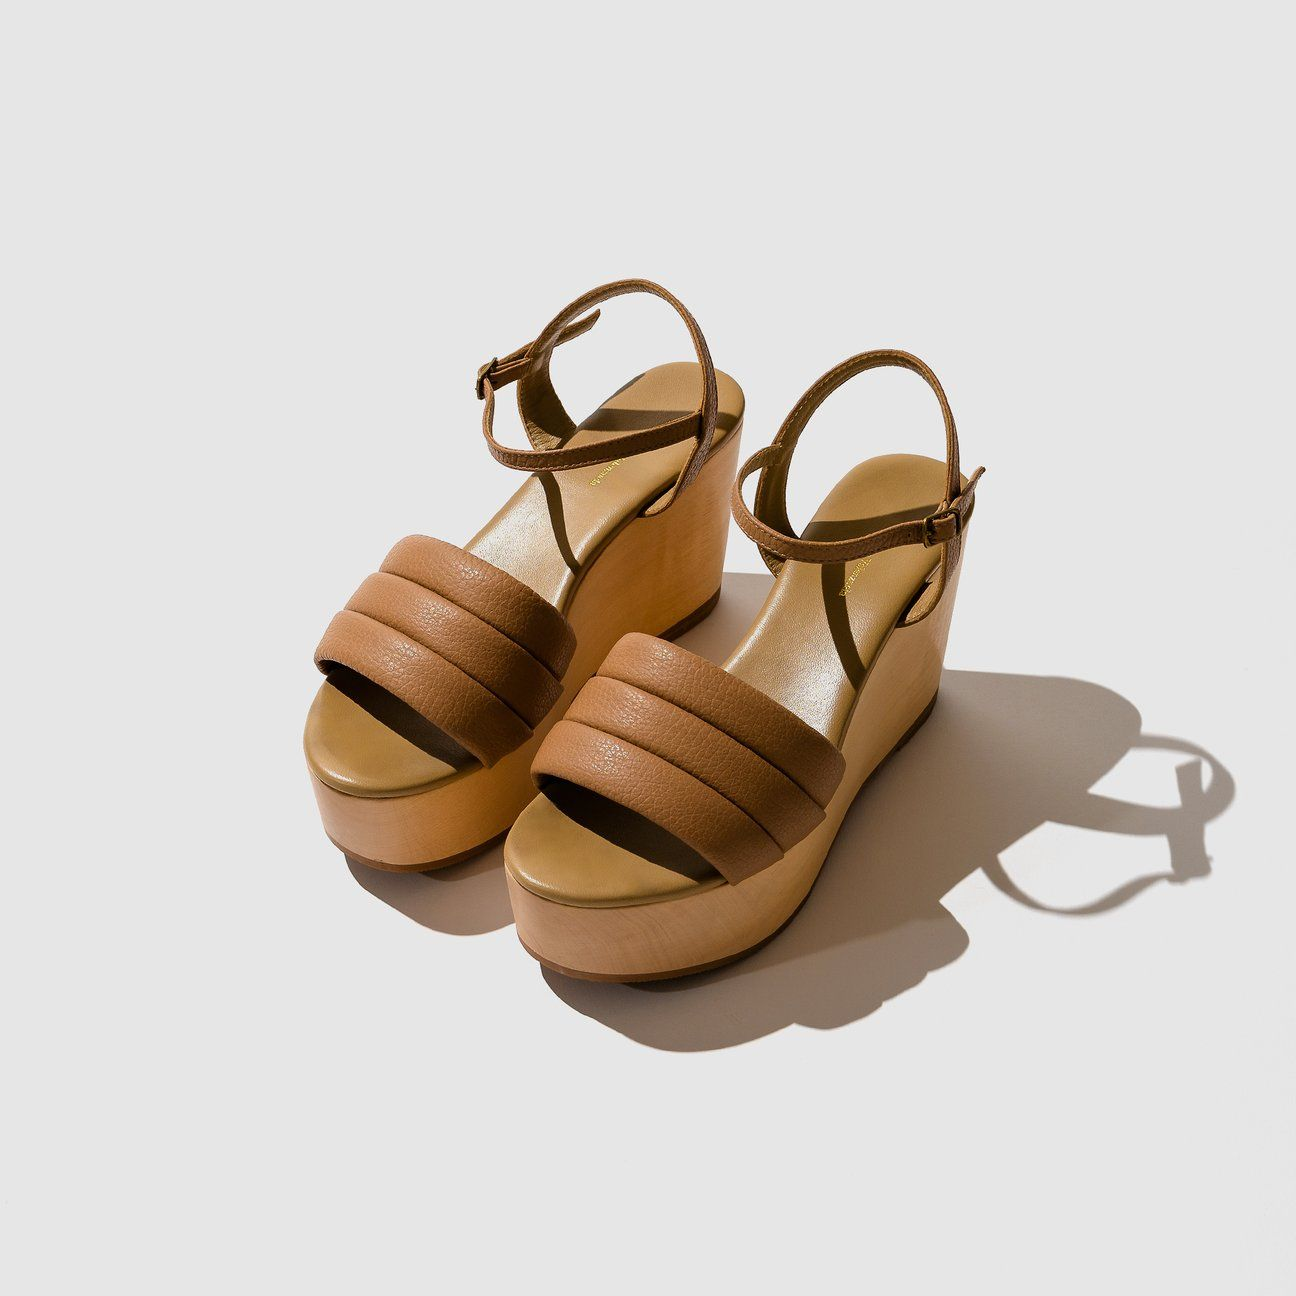 3f9a6ac06ecc Beatrice Valenzuela, Lambskin Leather, Black Pebbles, Black Wedges, Platform  Shoes, Fabric